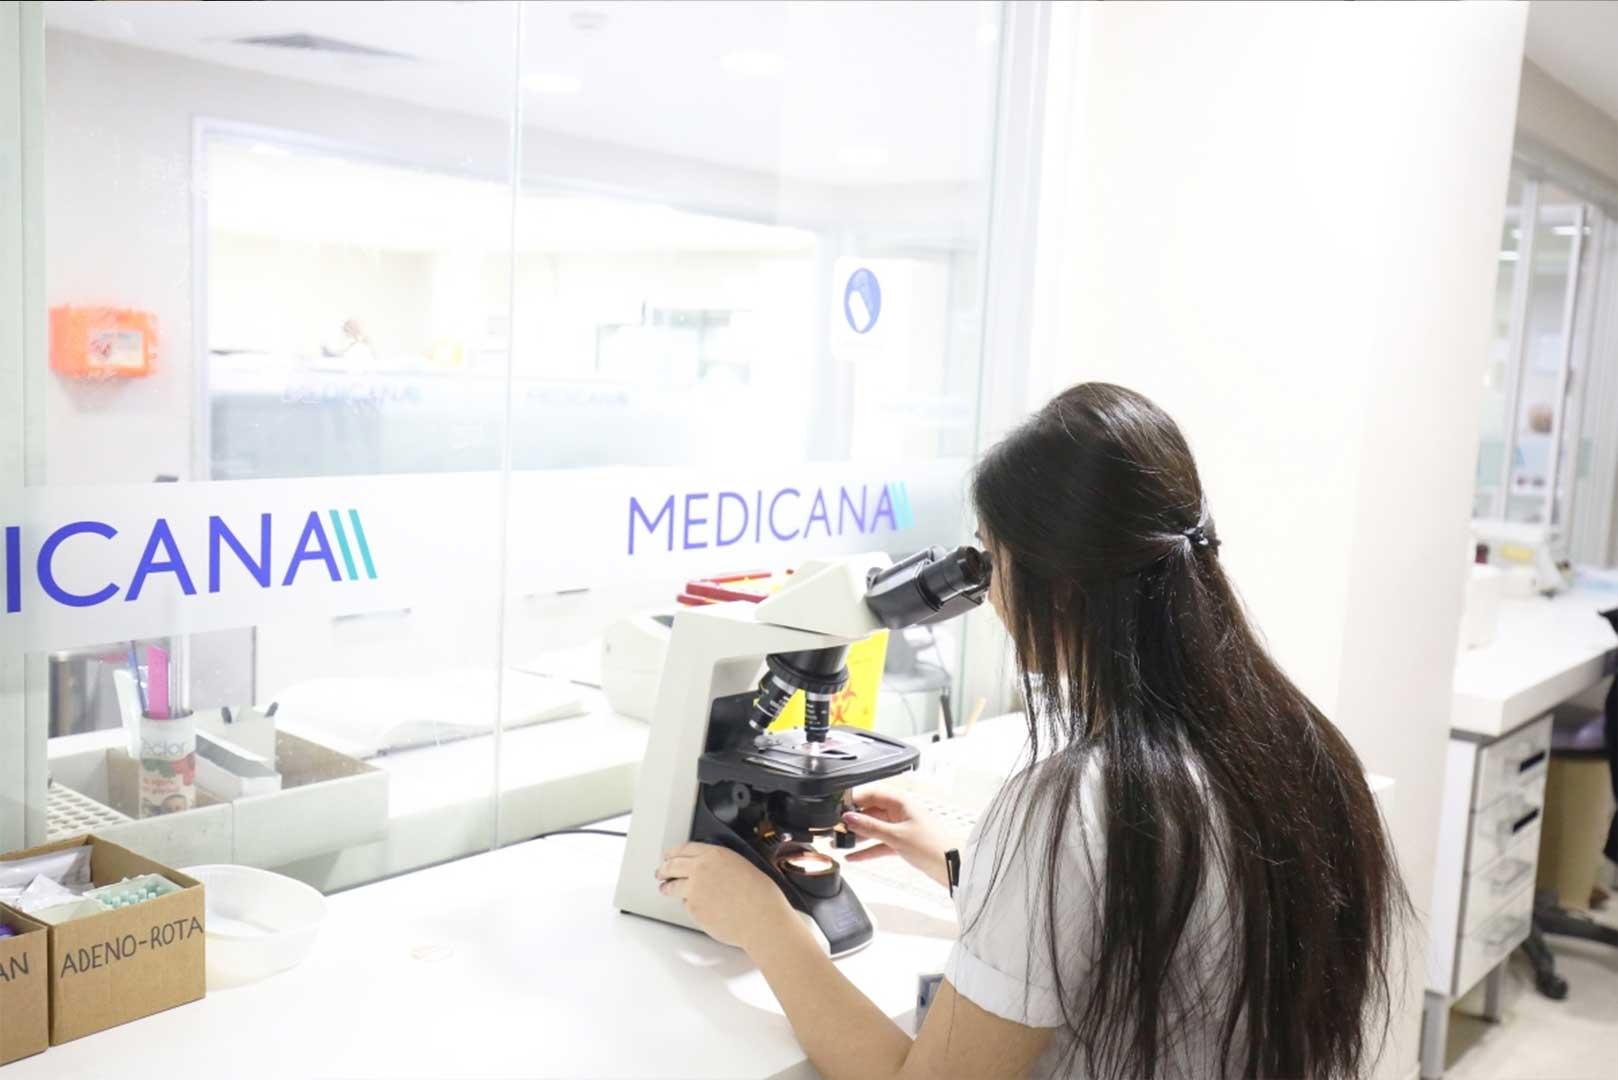 https://www.medicanahealthpoint.com/wp-content/uploads/2020/10/medicana-sivas-6.jpg